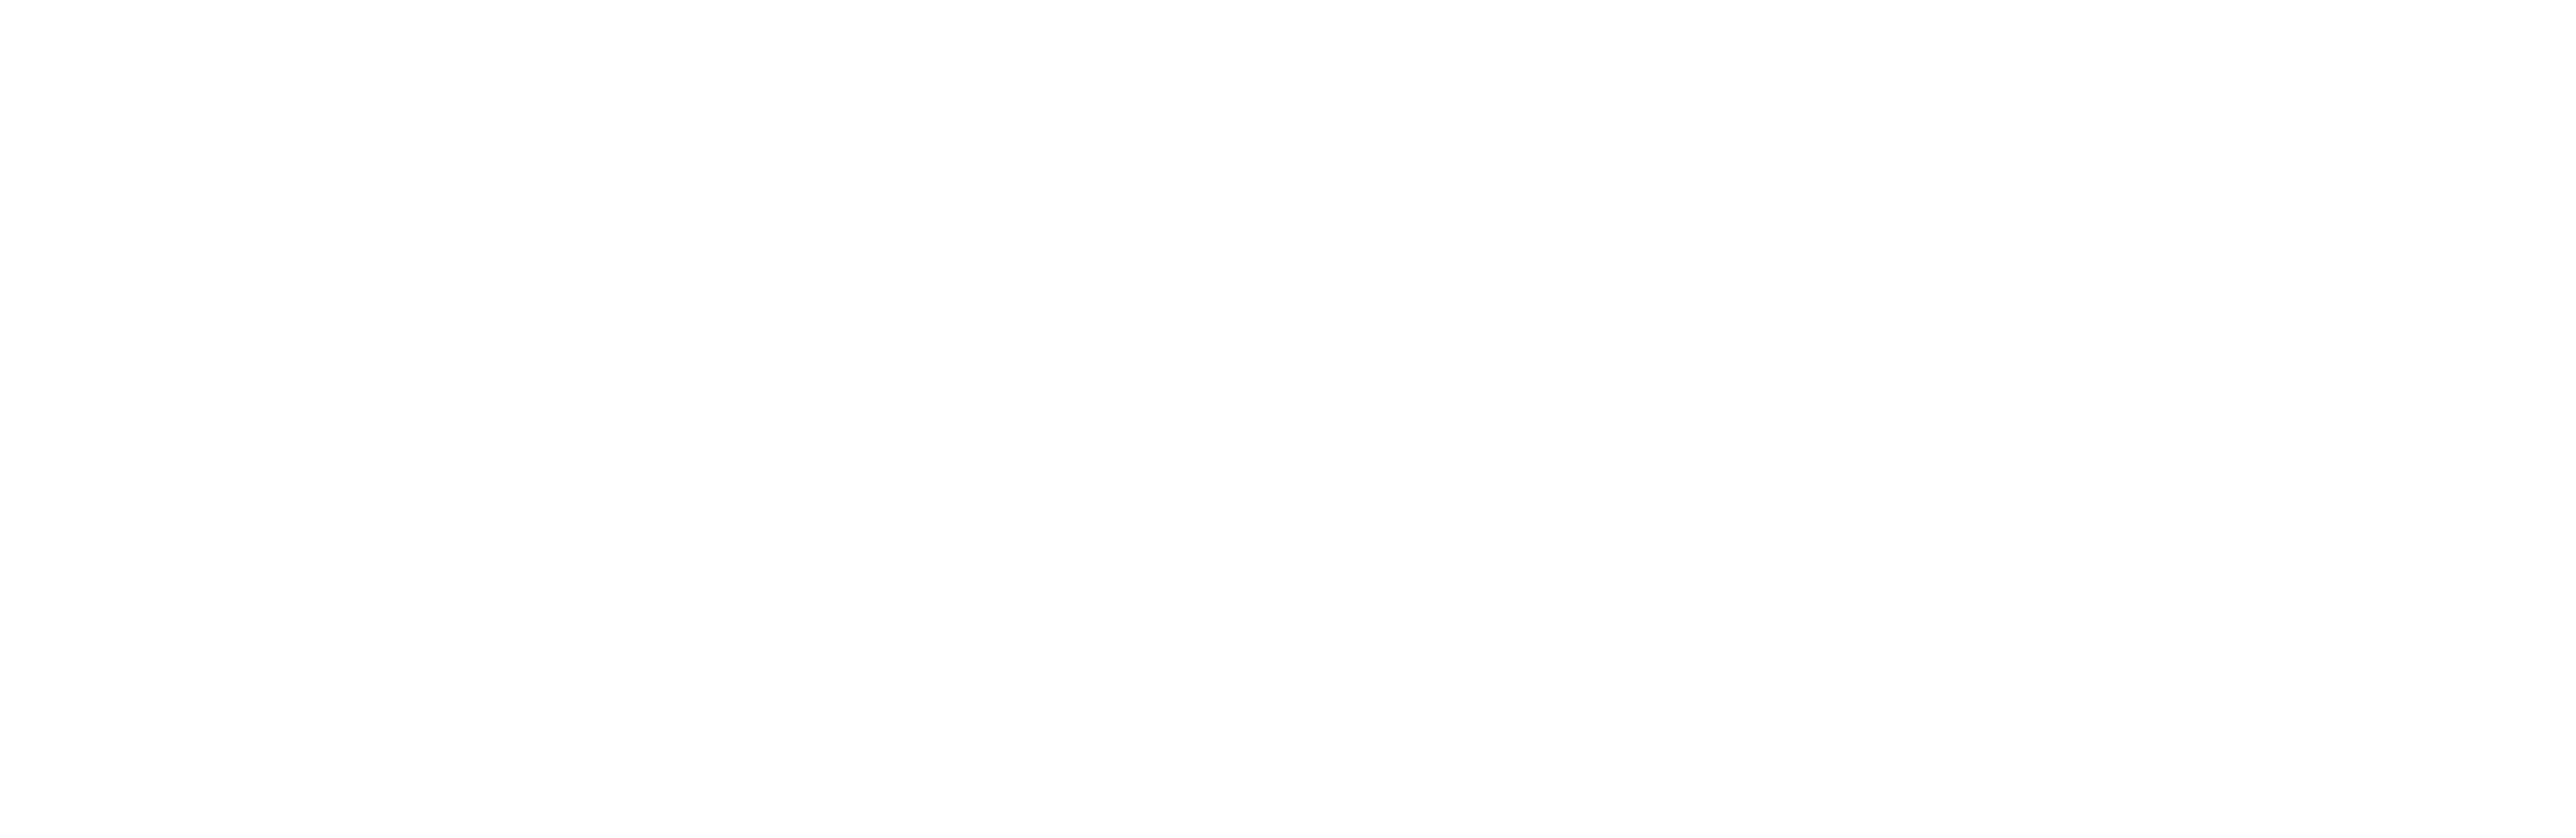 Planning Capital Management